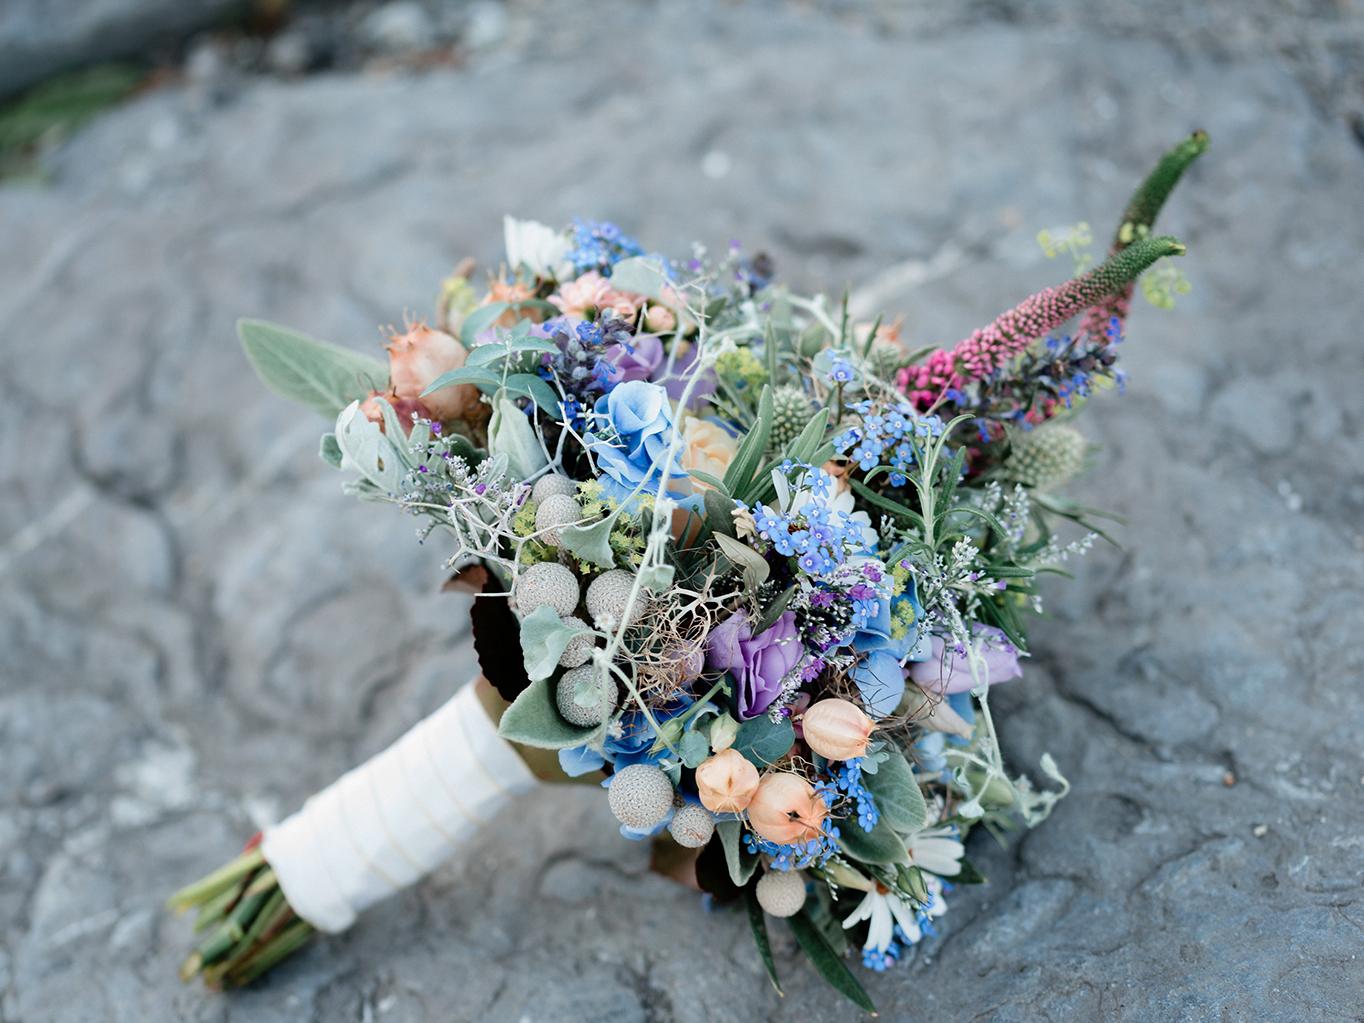 Blumen Heck Lindauer Str 35 88069 Tettnang